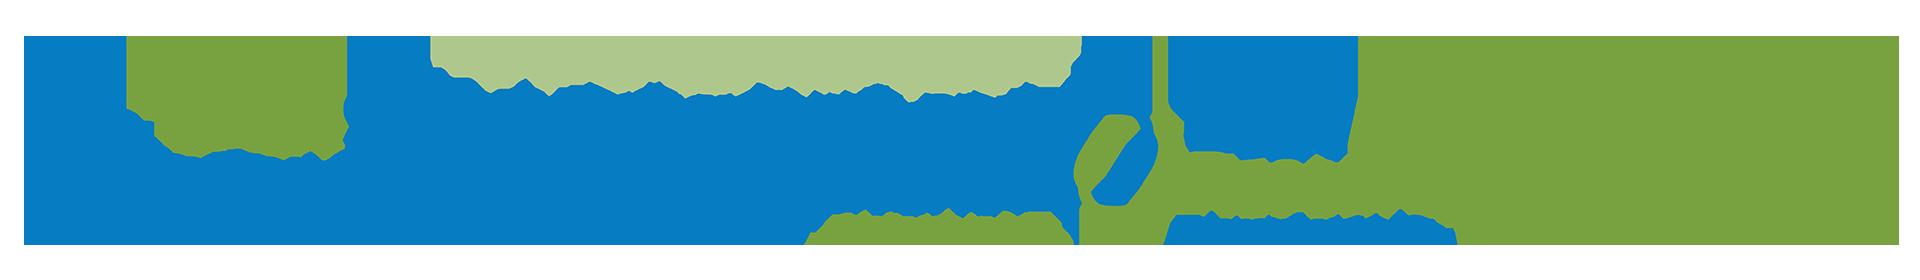 2021 AER Conference Event Banner